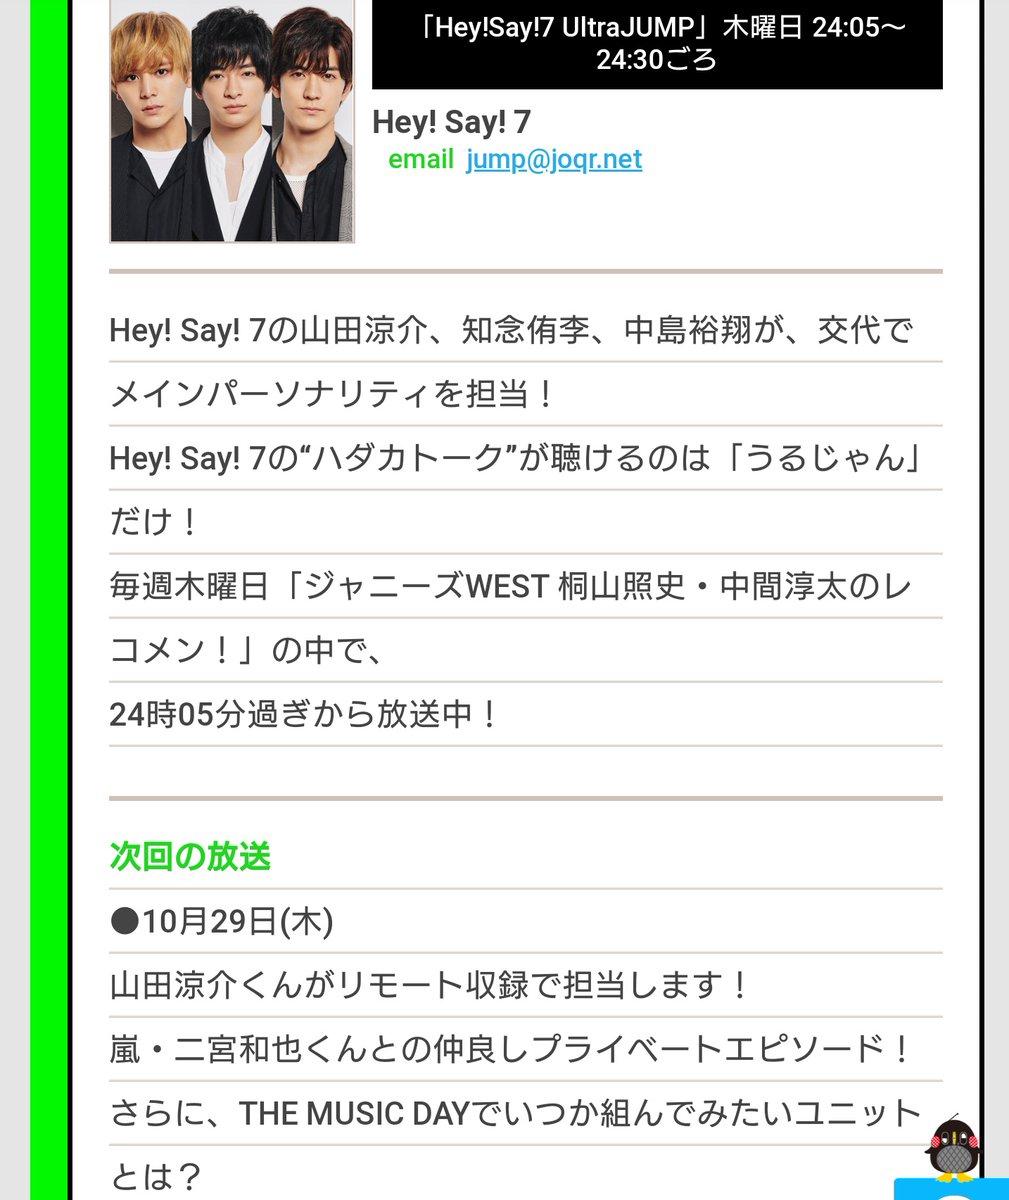 test ツイッターメディア - 10/29㈭ラジオ⑤   24:05-24:30  Hey! Say! 7 UltraJUMP(文化放送)/#山田涼介 #HeySayJUMP #ジャニーズ https://t.co/ZzSPLMcfKF https://t.co/AfgXk0NxM2